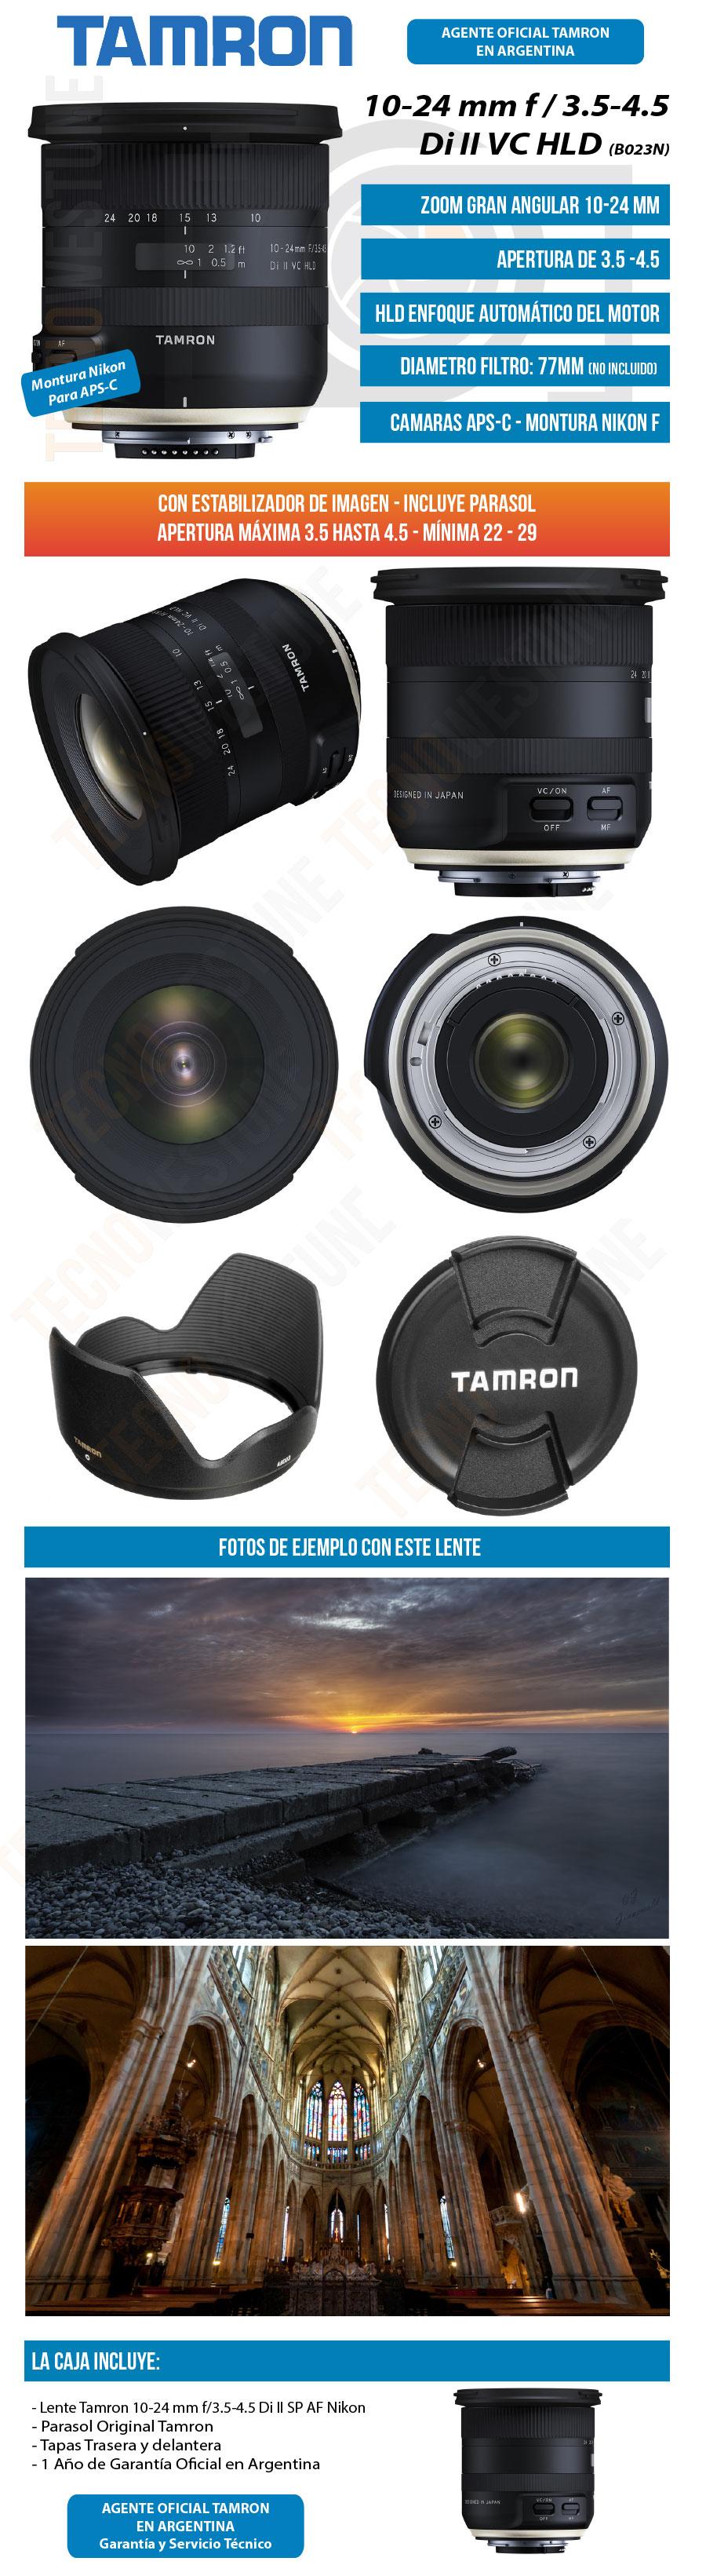 B023N-10-24mm-fr3